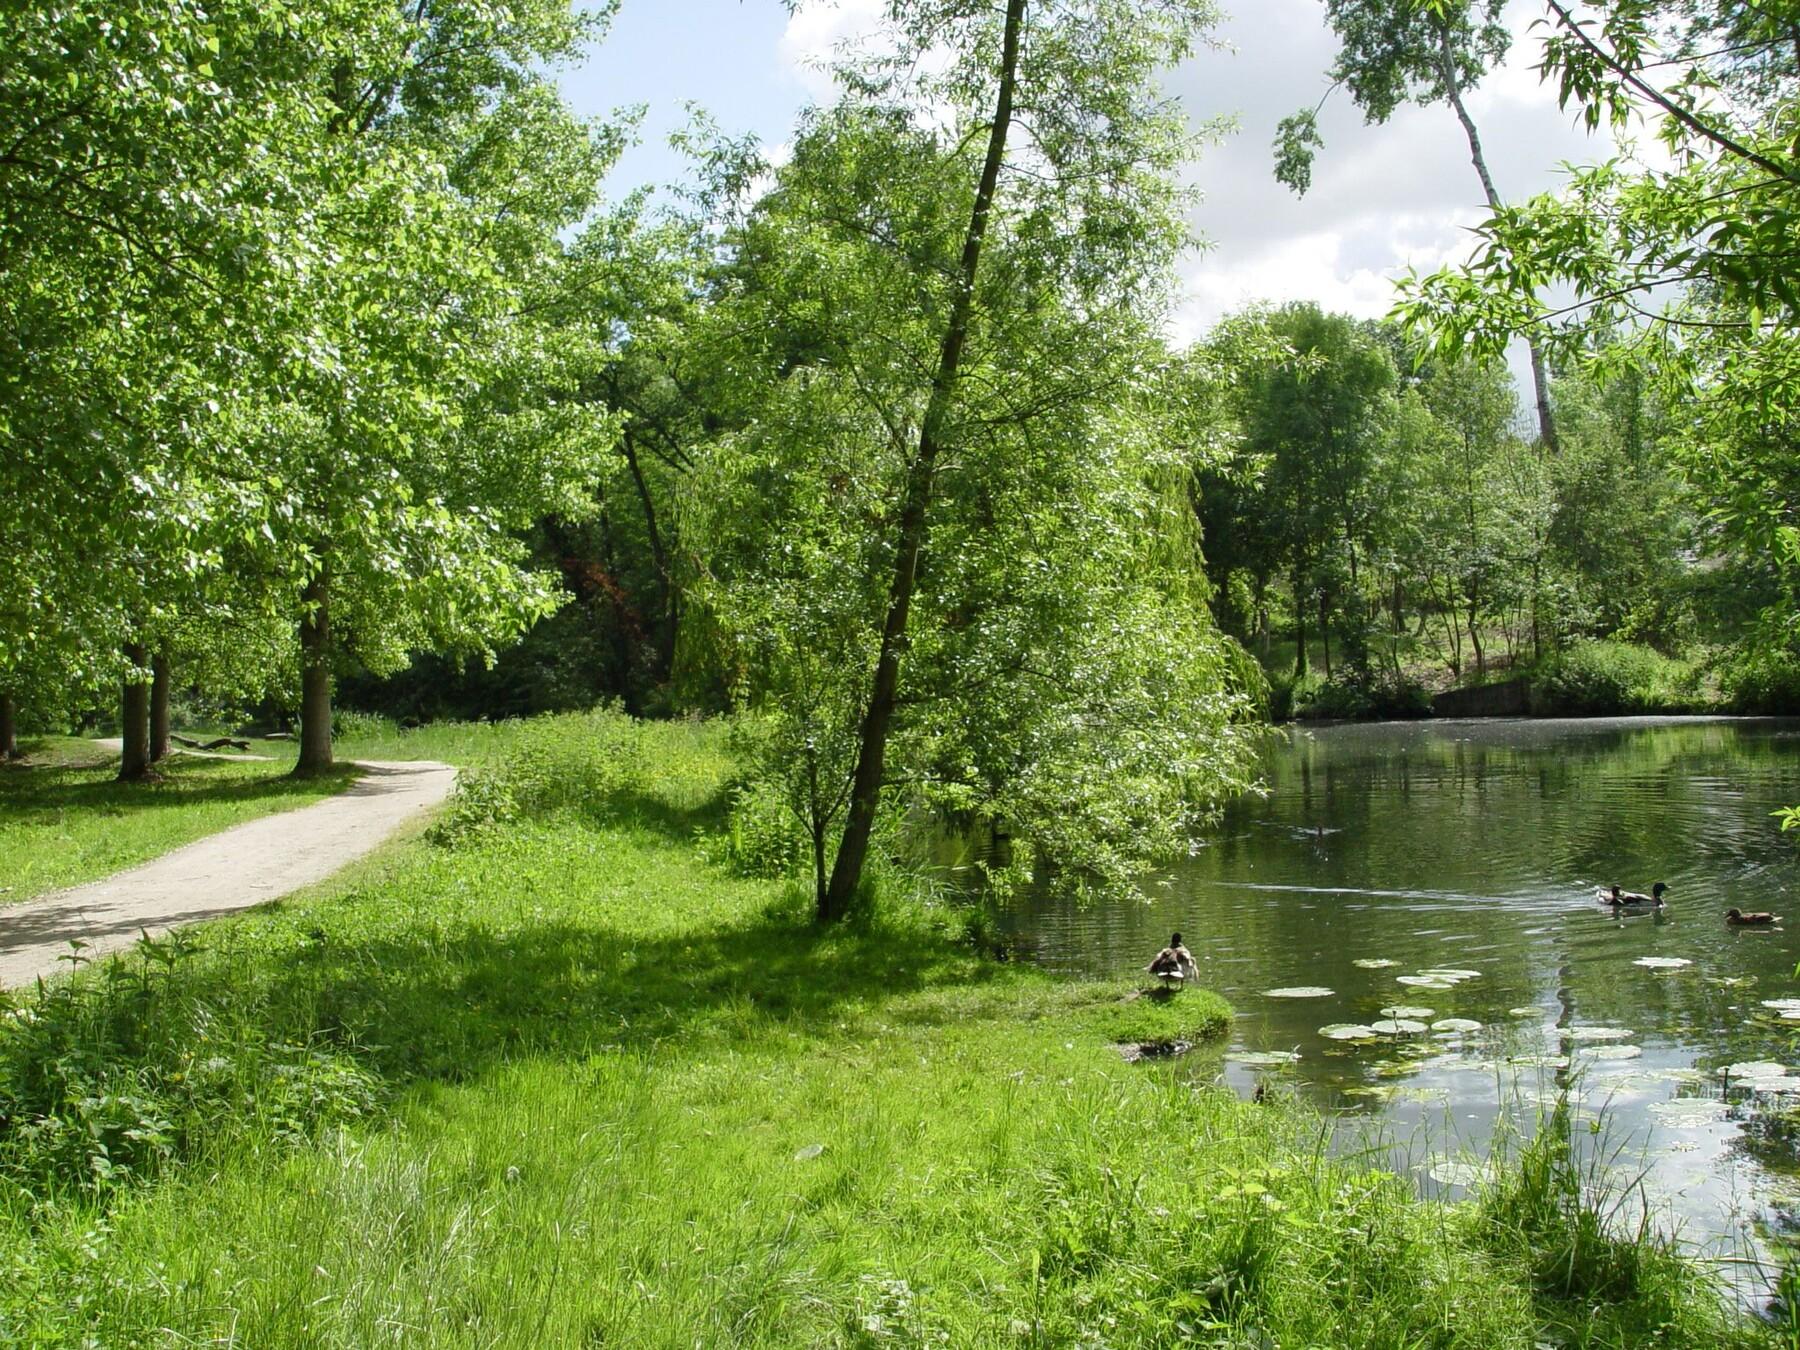 Parcs et espaces naturels epinay sous s nart for Piscine yerres